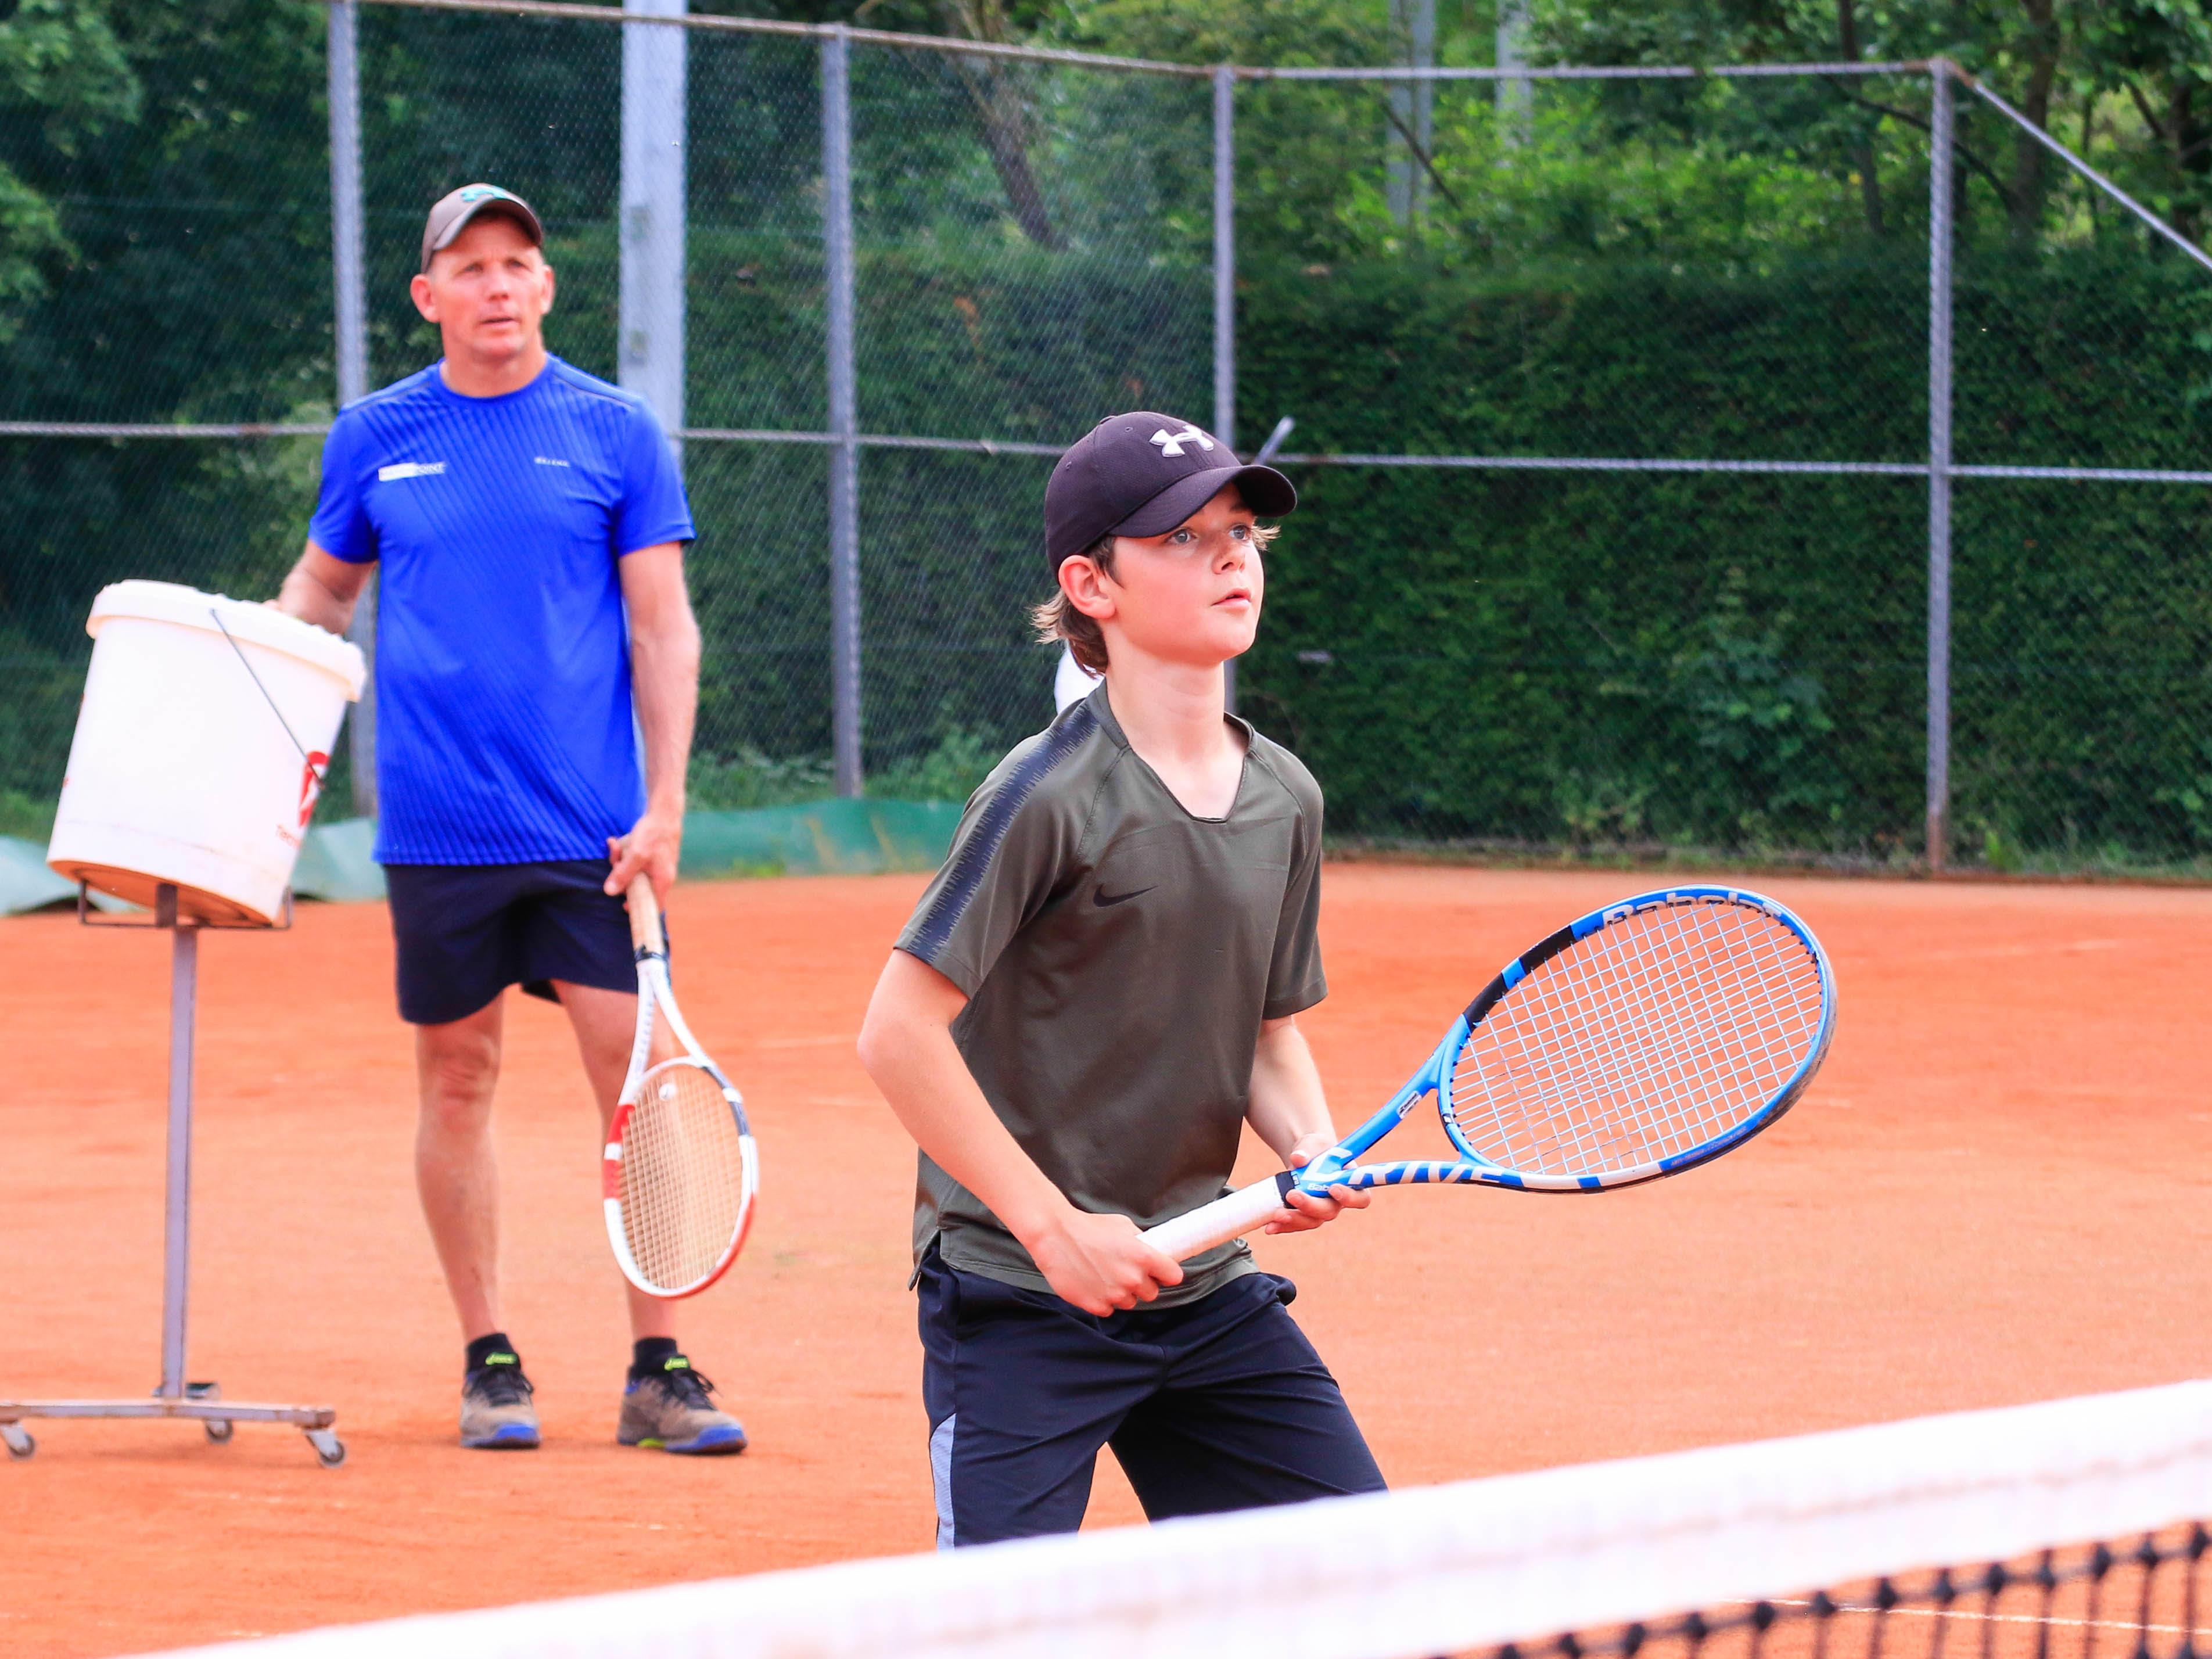 Tennis GTR Training